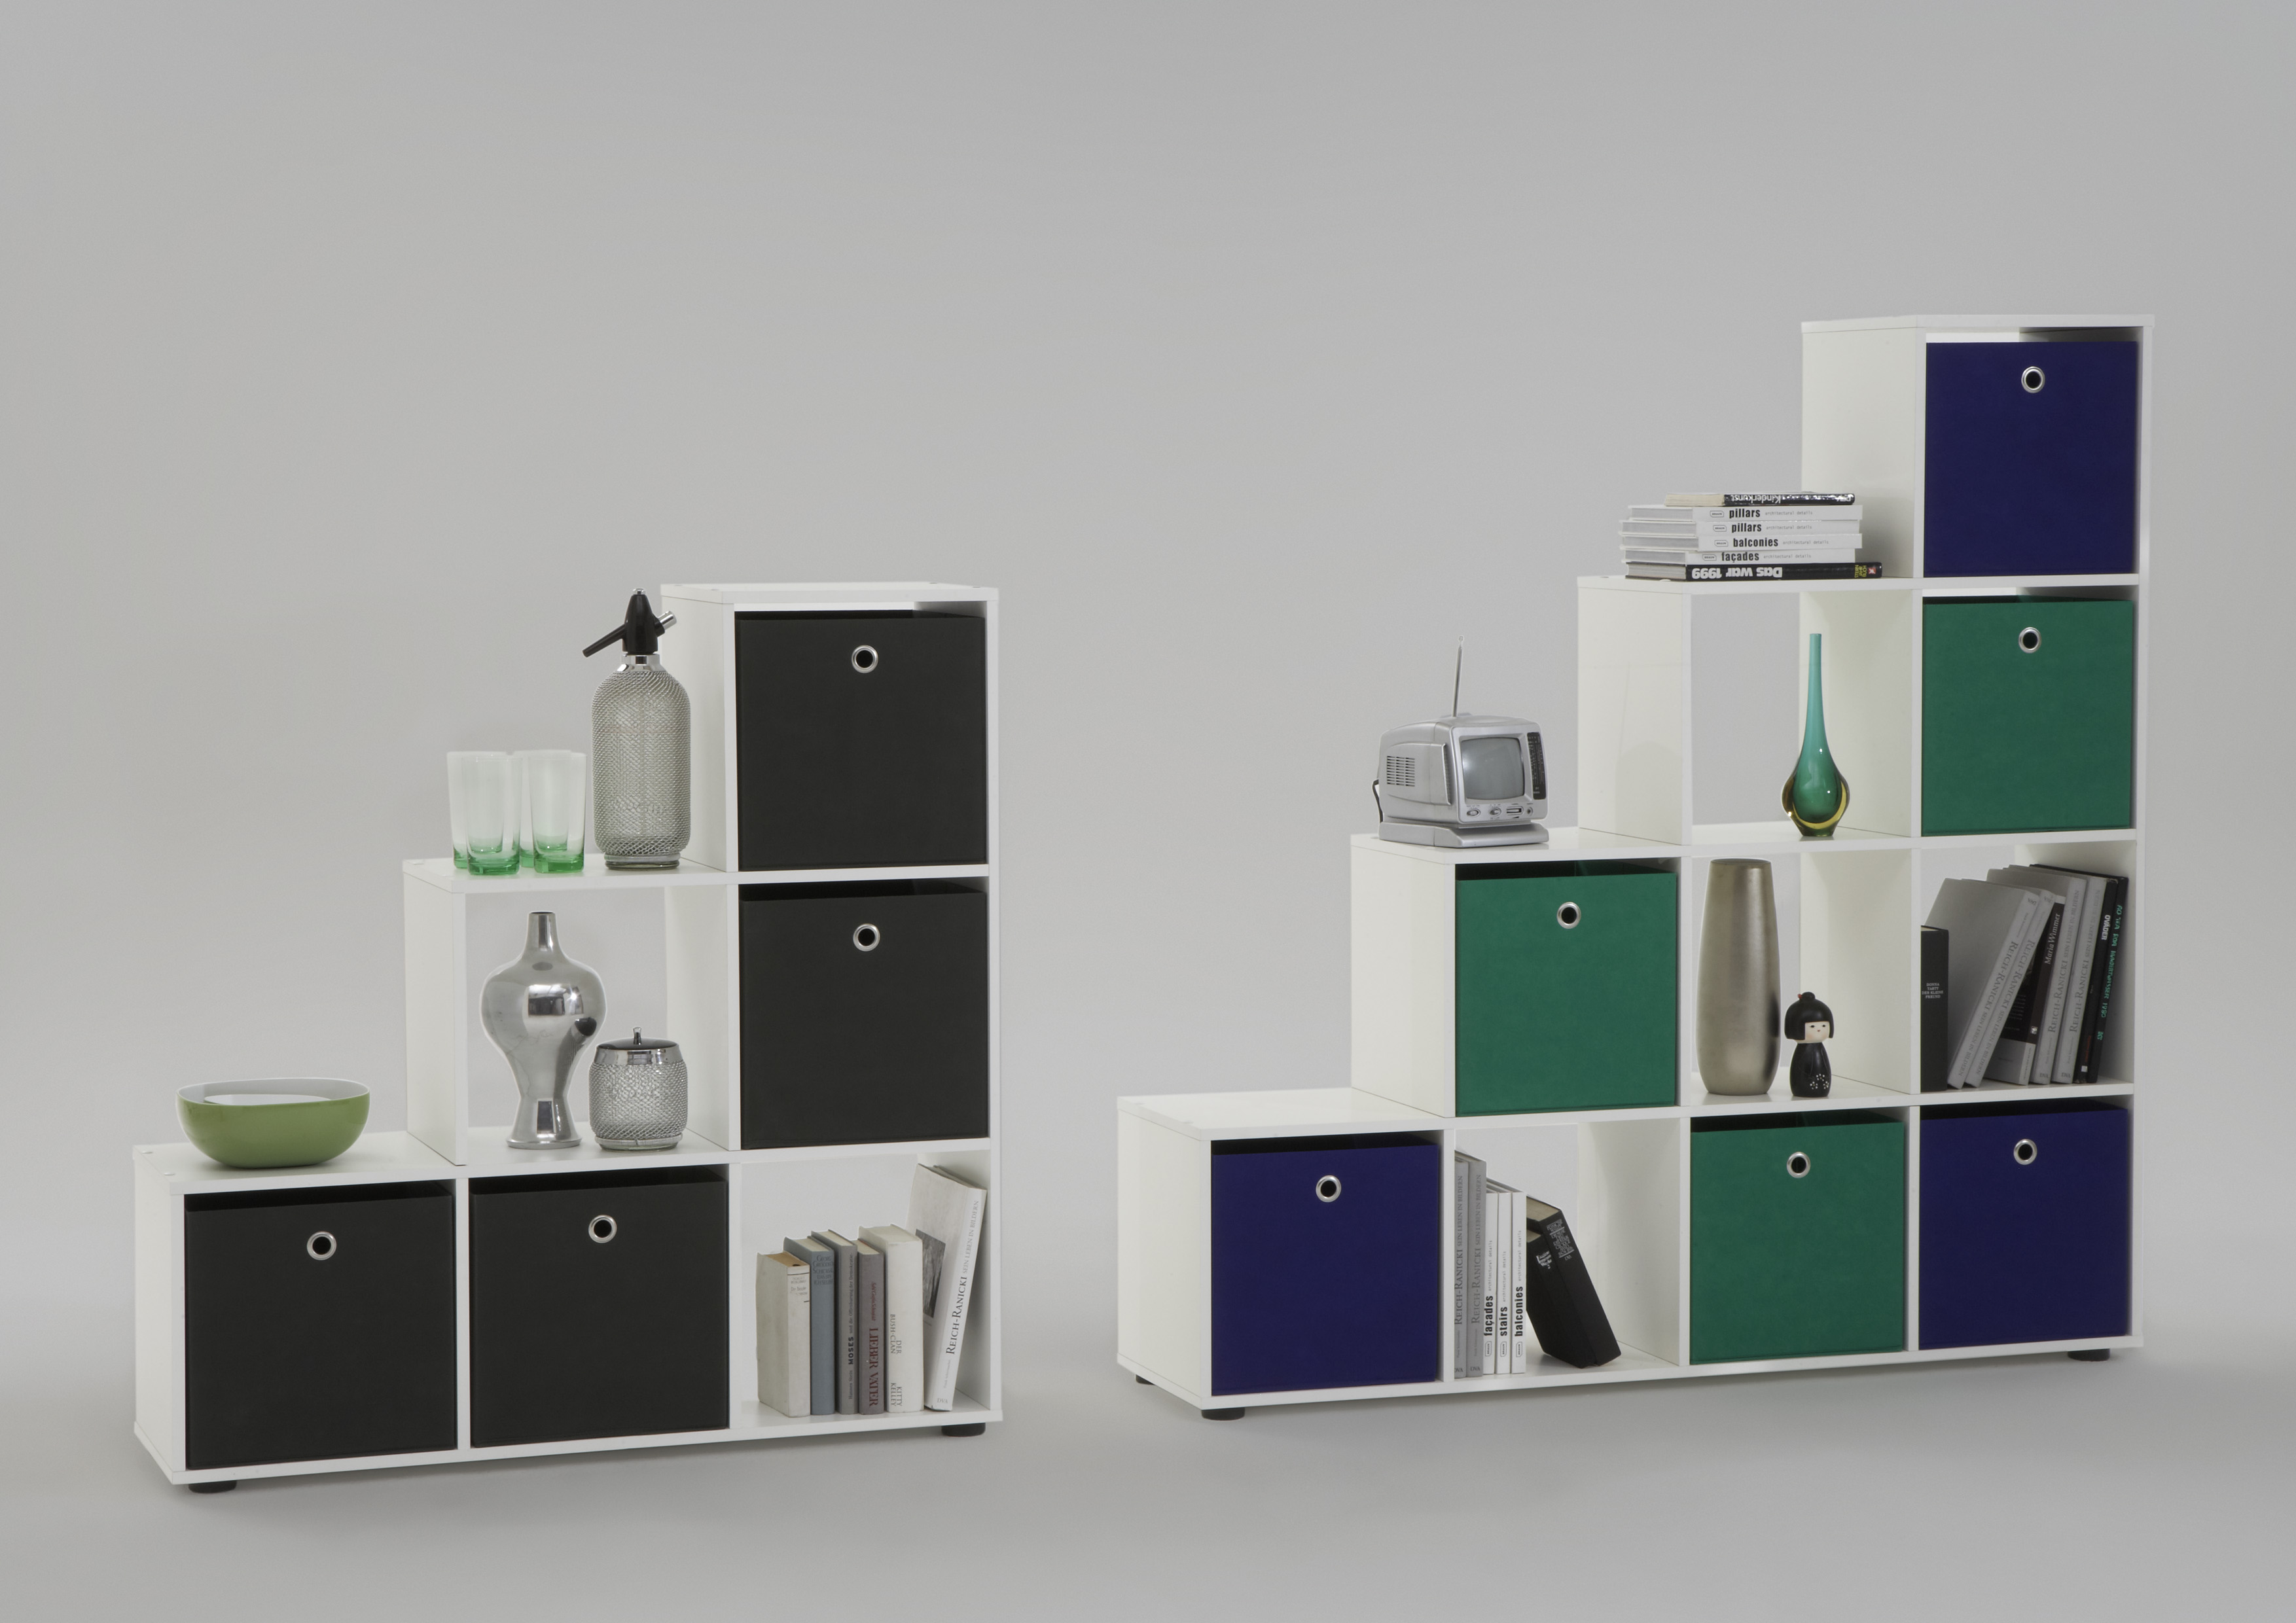 mega 1 raumteiler bestseller shop f r m bel und einrichtungen. Black Bedroom Furniture Sets. Home Design Ideas